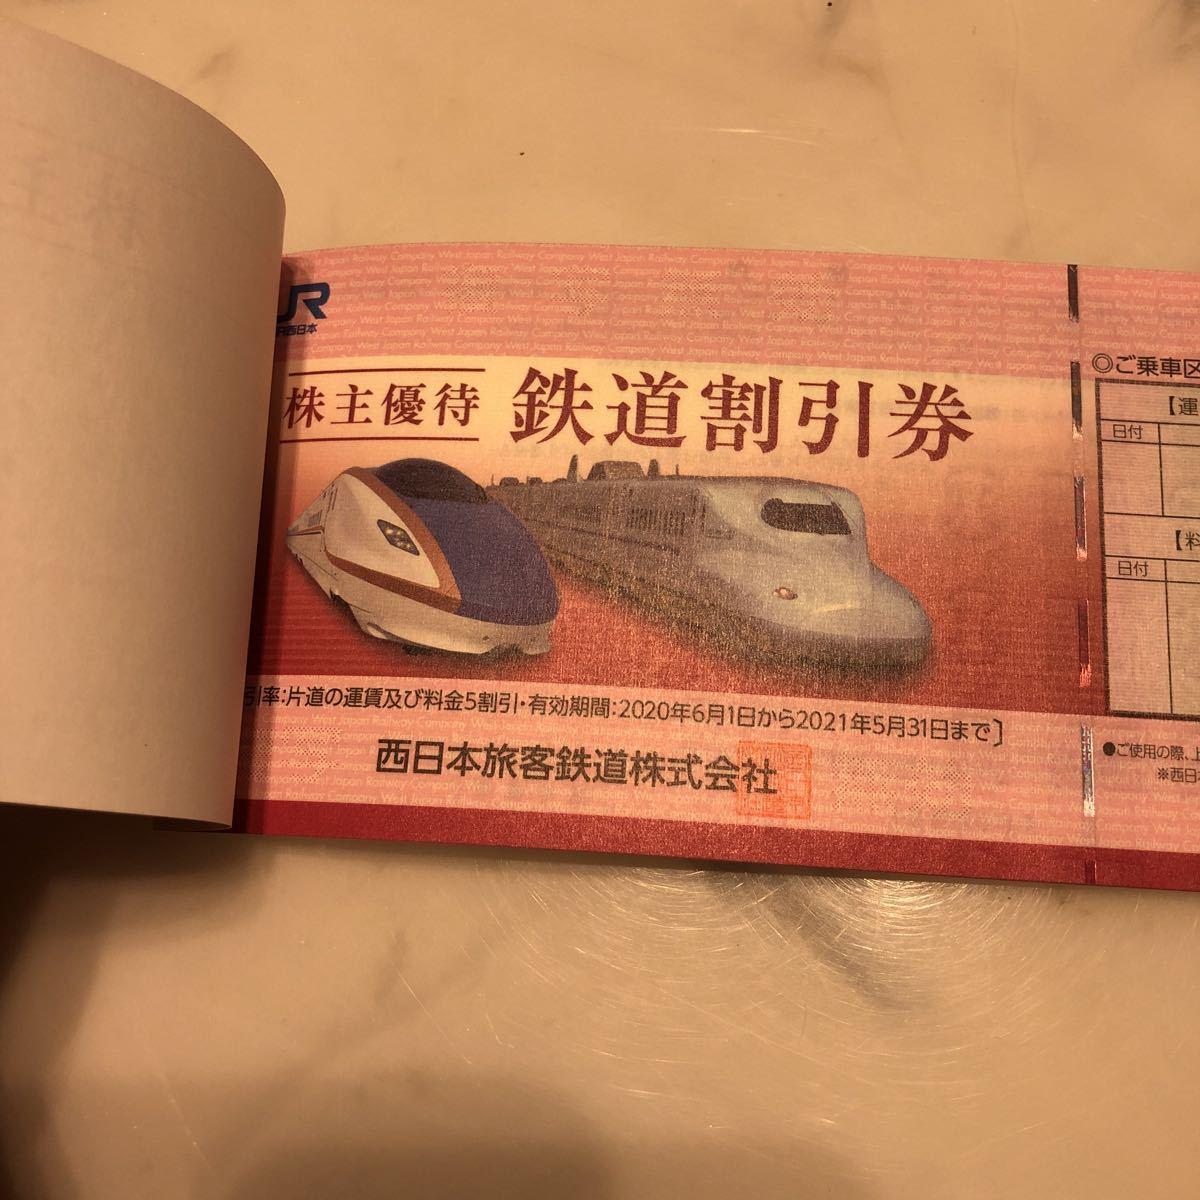 JR西日本 株主優待割引券2枚+優待割引券2021年5月31日まで_画像4